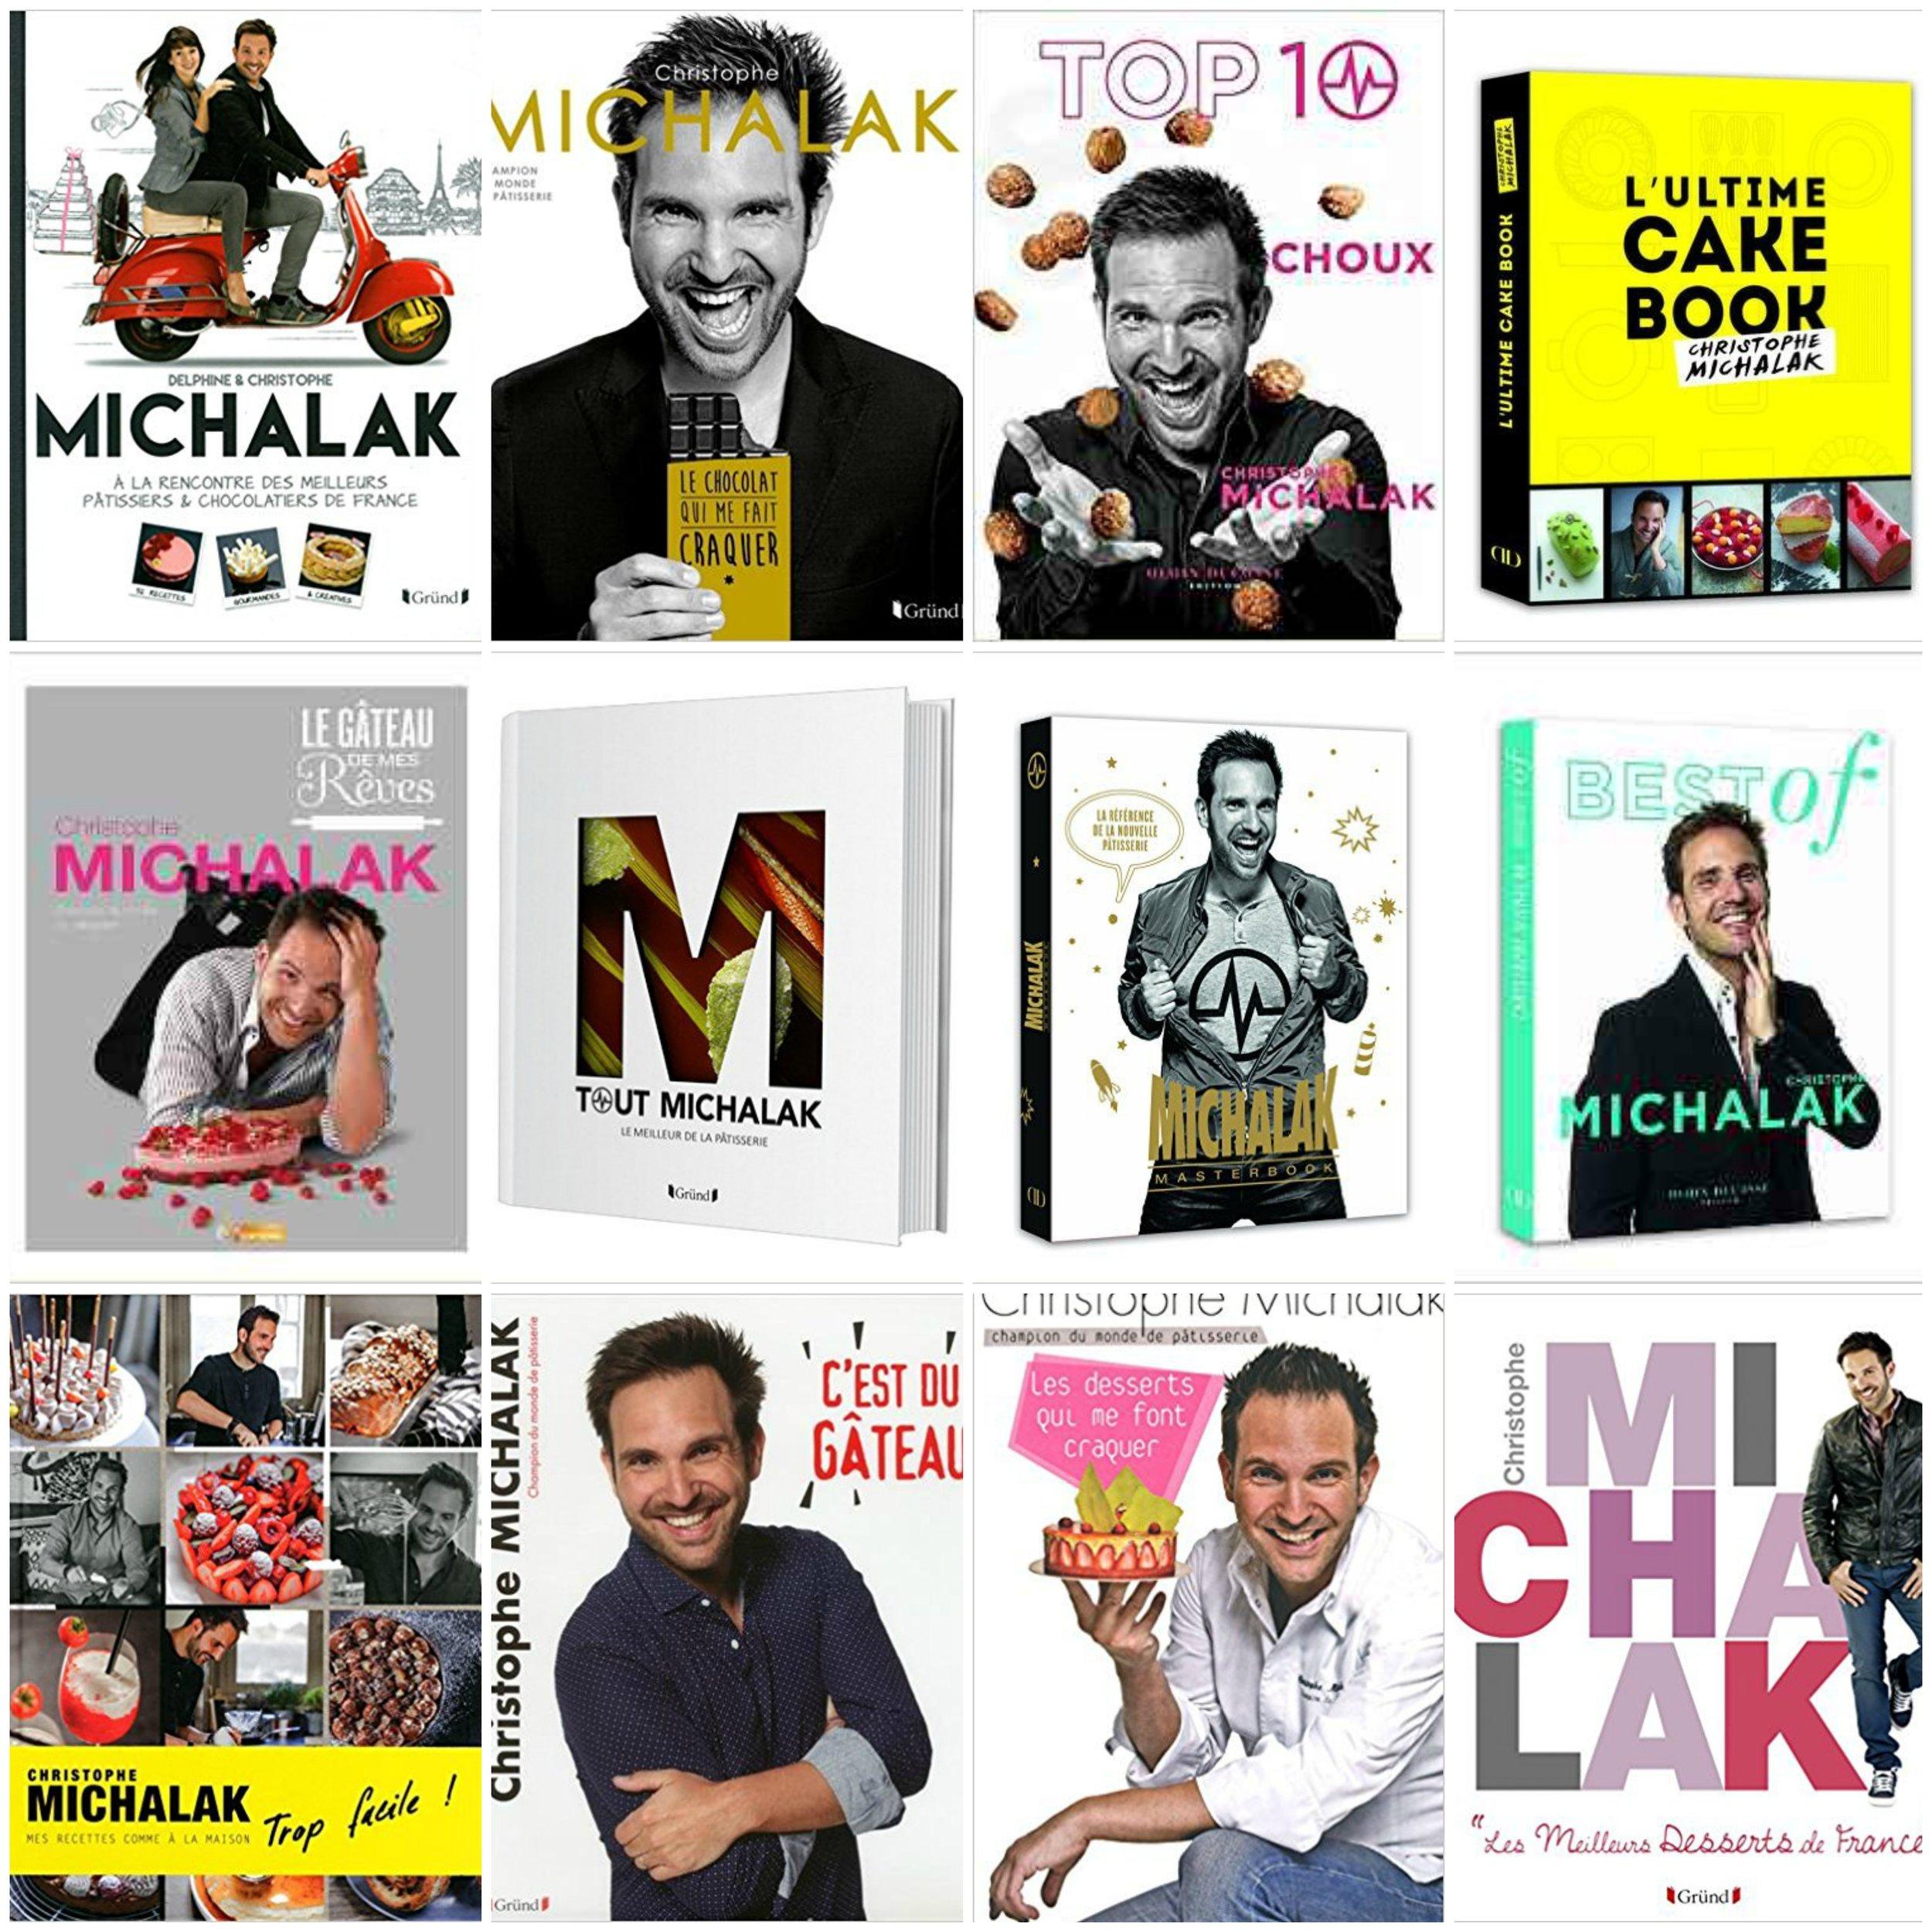 圖2. 幾本 Michalak 食譜書封面(圖片來源: Amazon.fr )